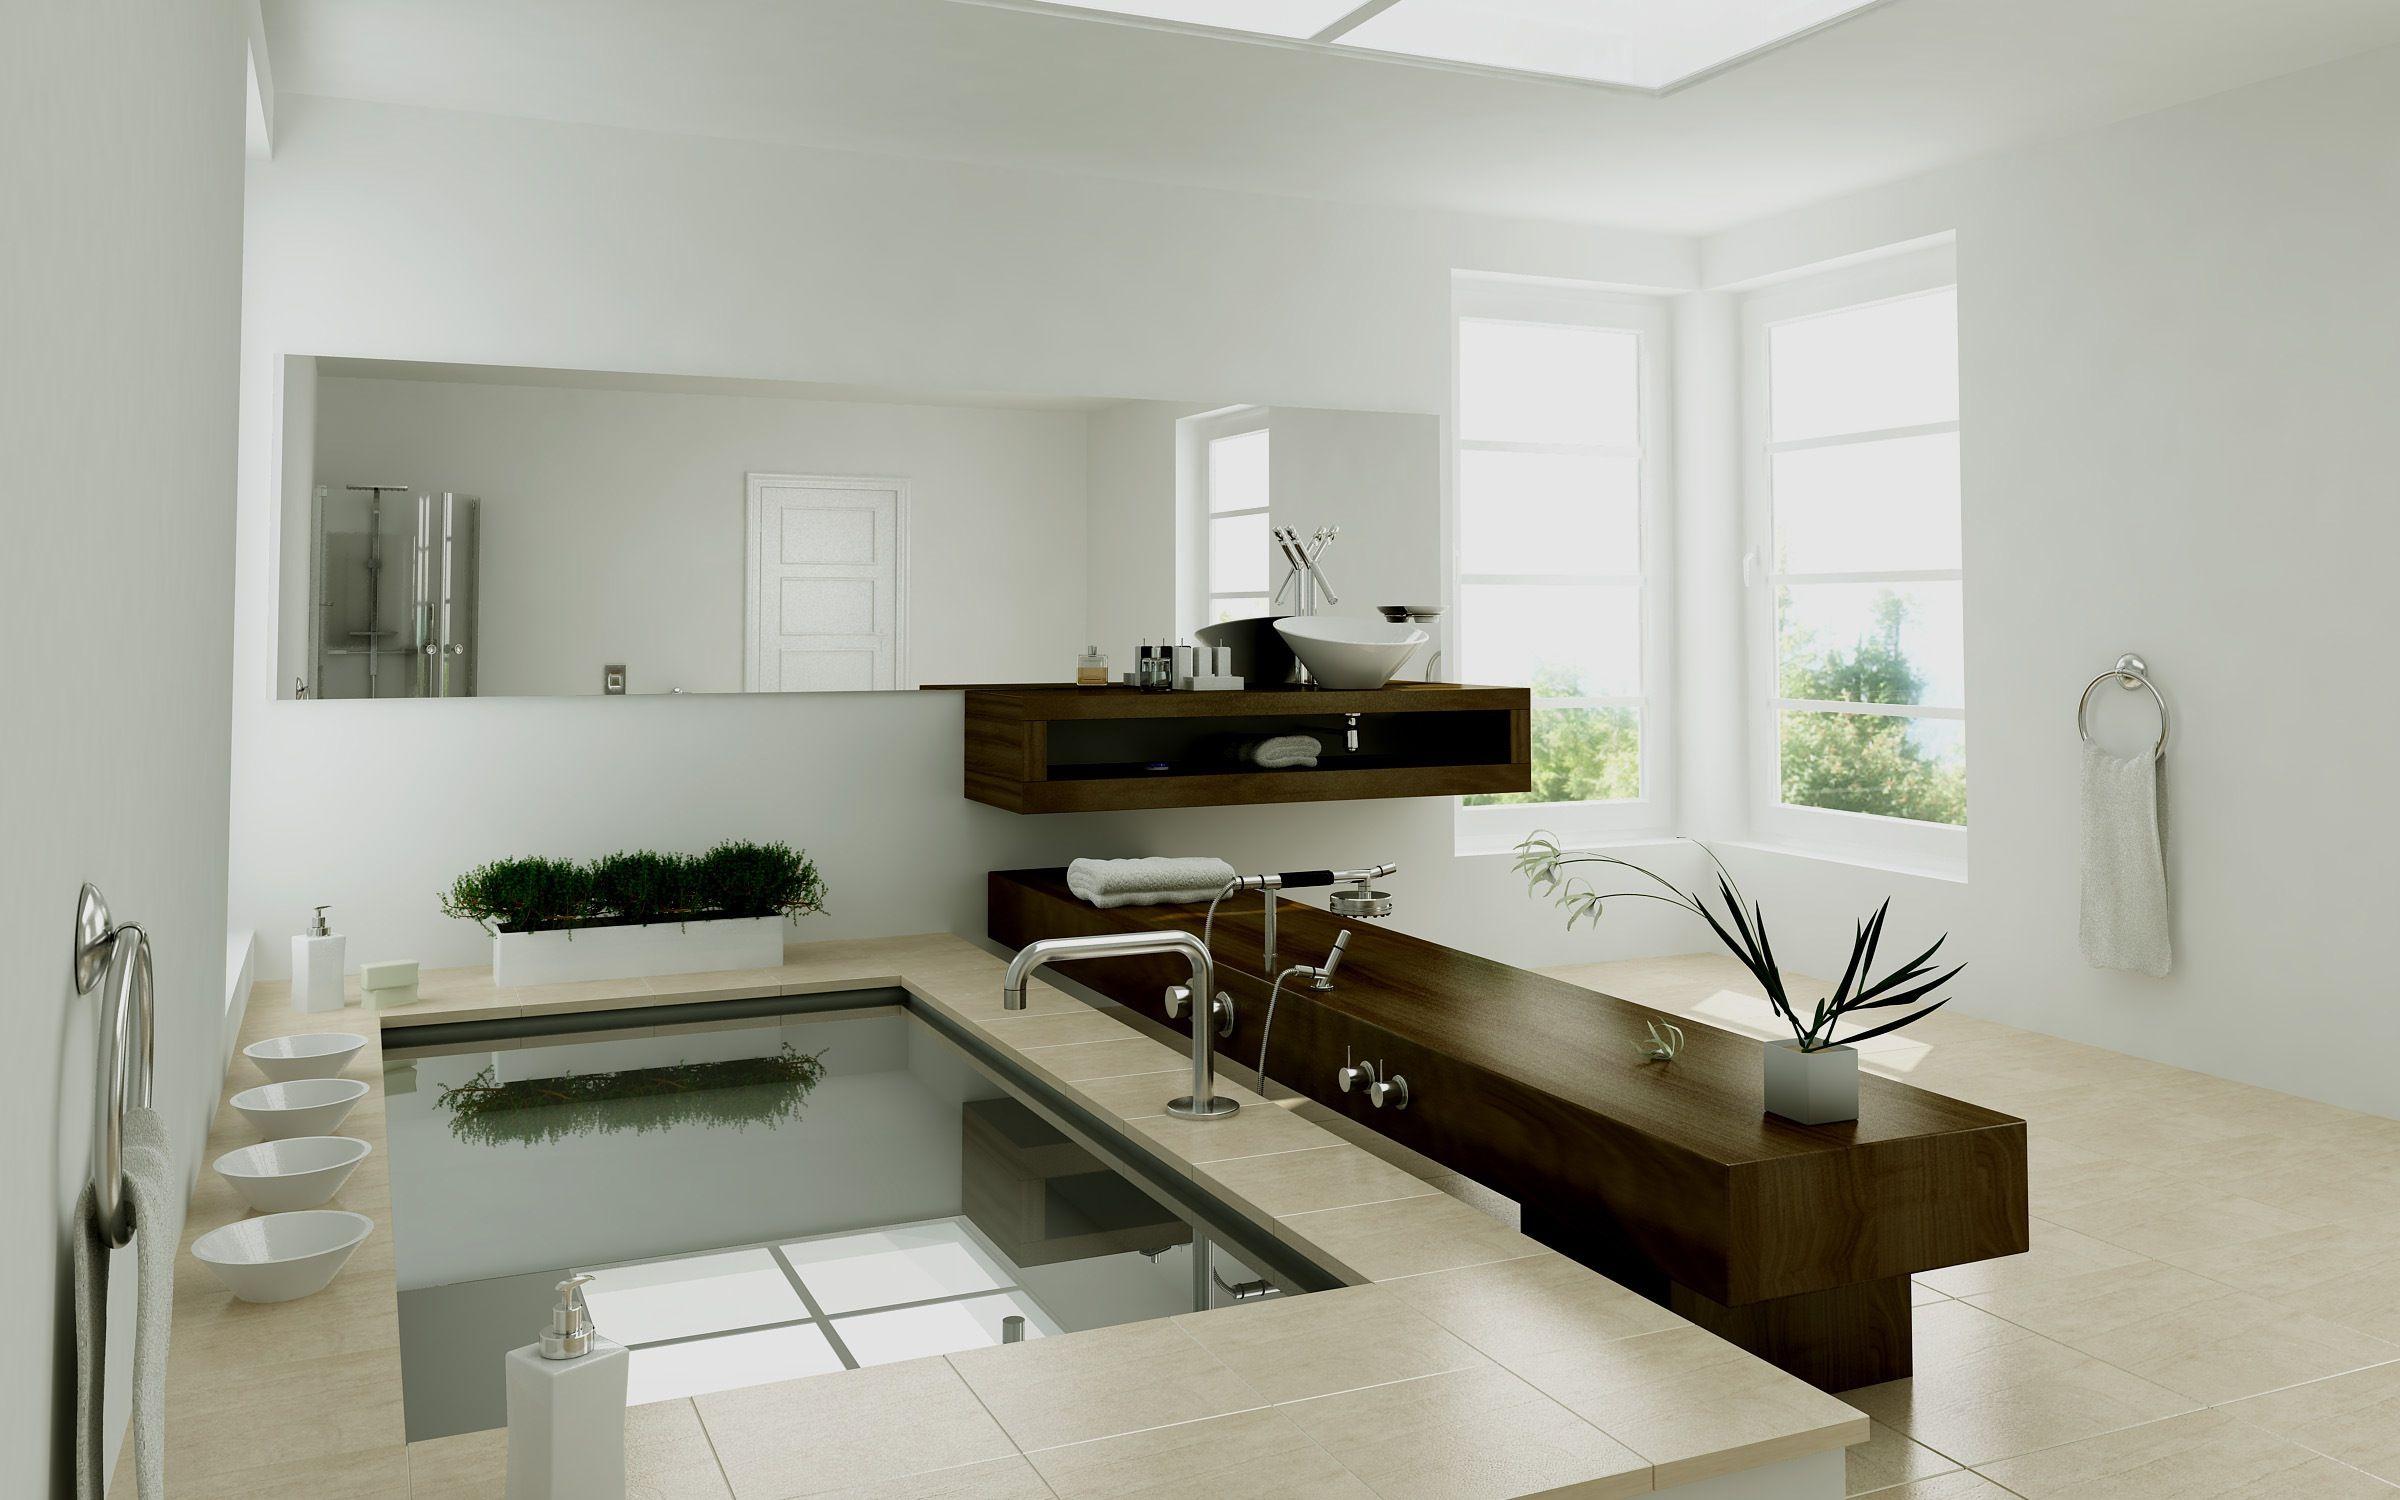 Sample Bathroom Rendering | Lumion Design Software ...